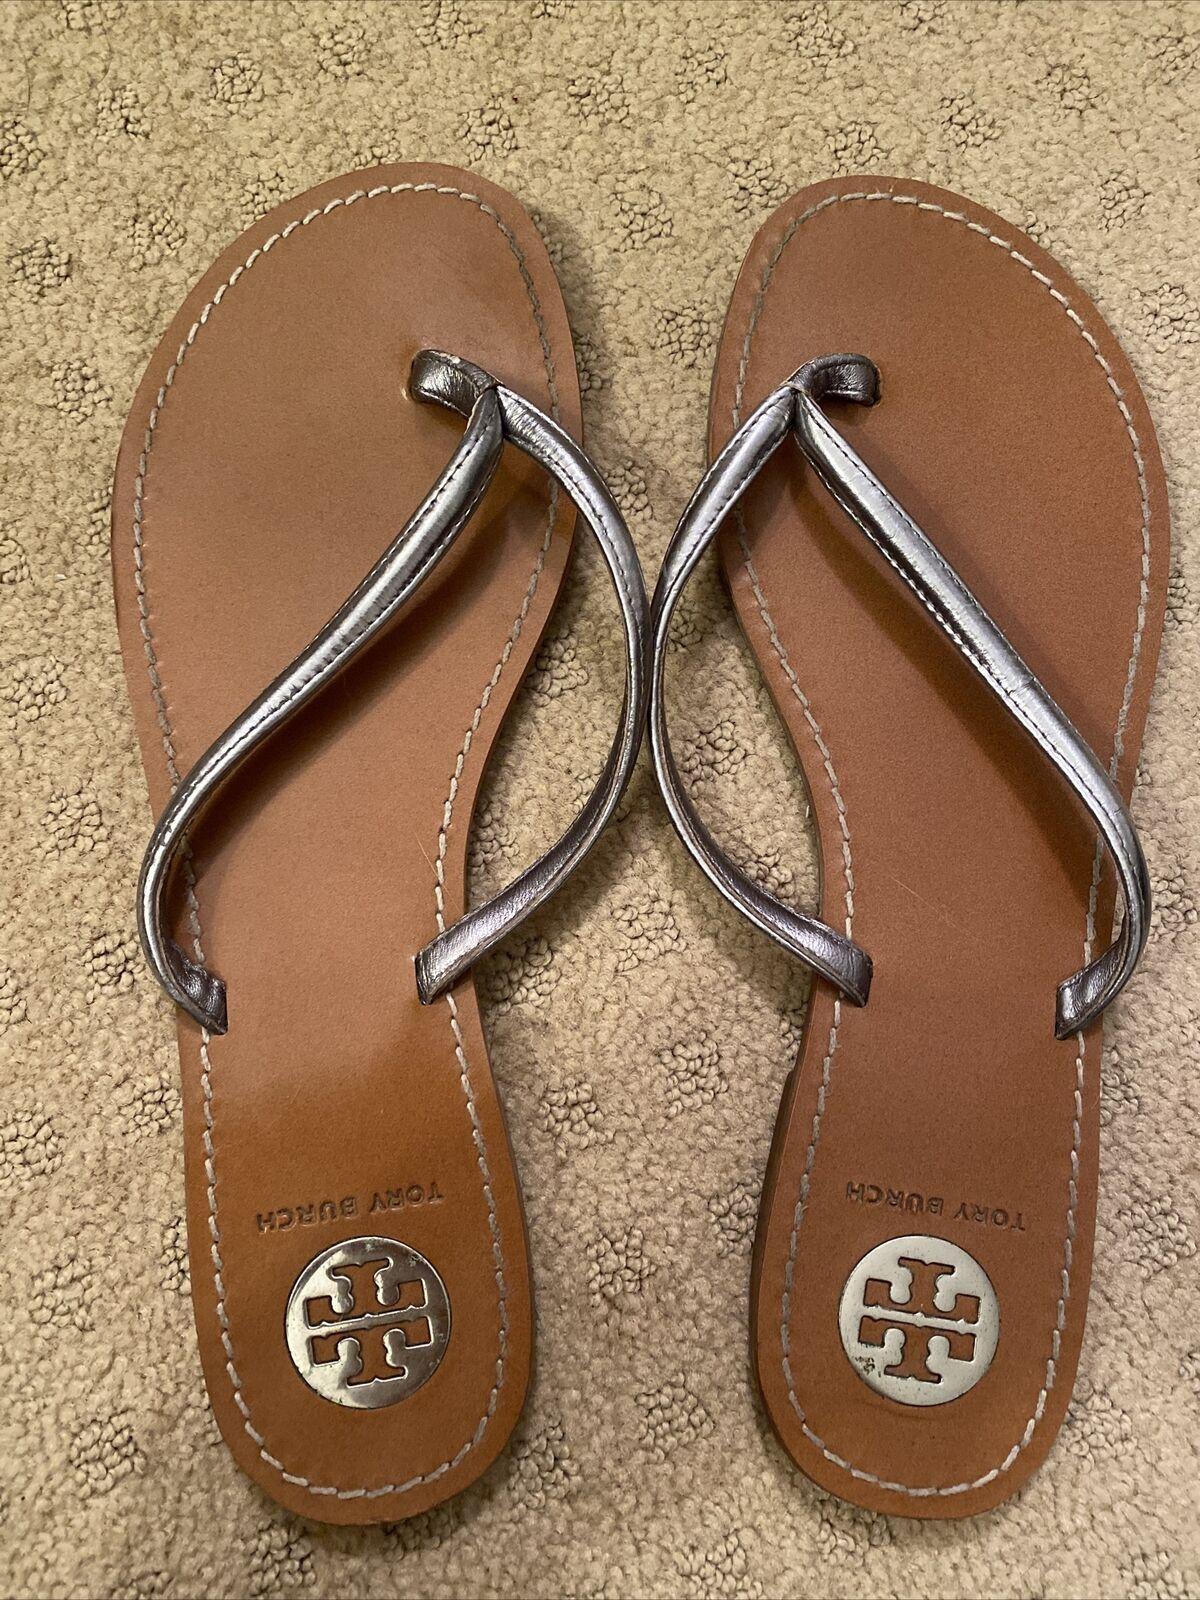 Tory Burch Sandal - image 1